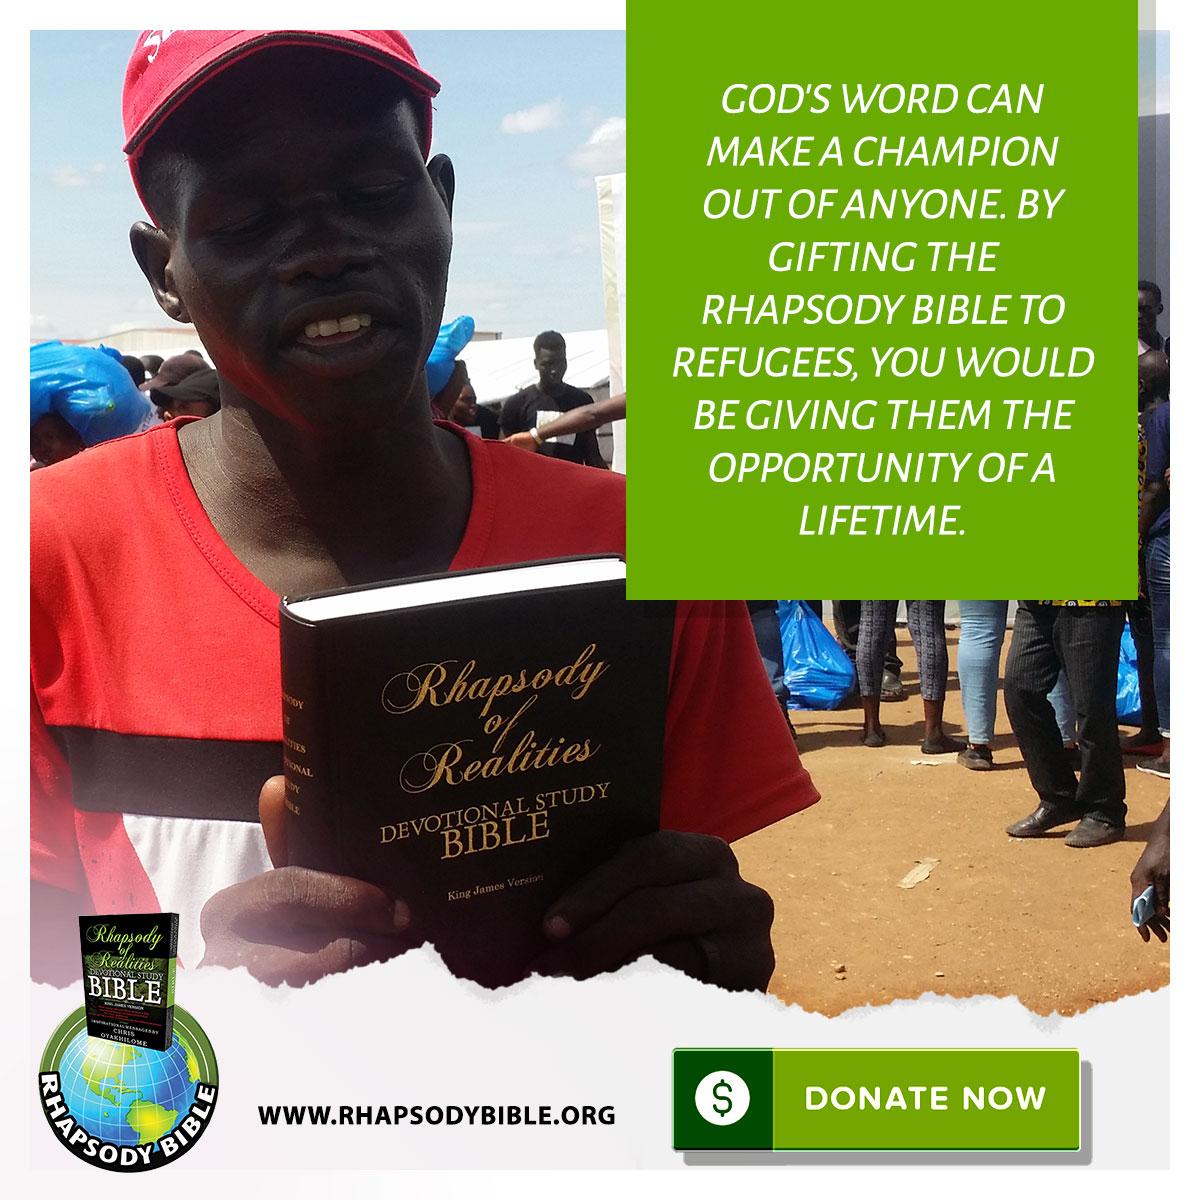 Rhapsody of Realities Bibel Campaign Online